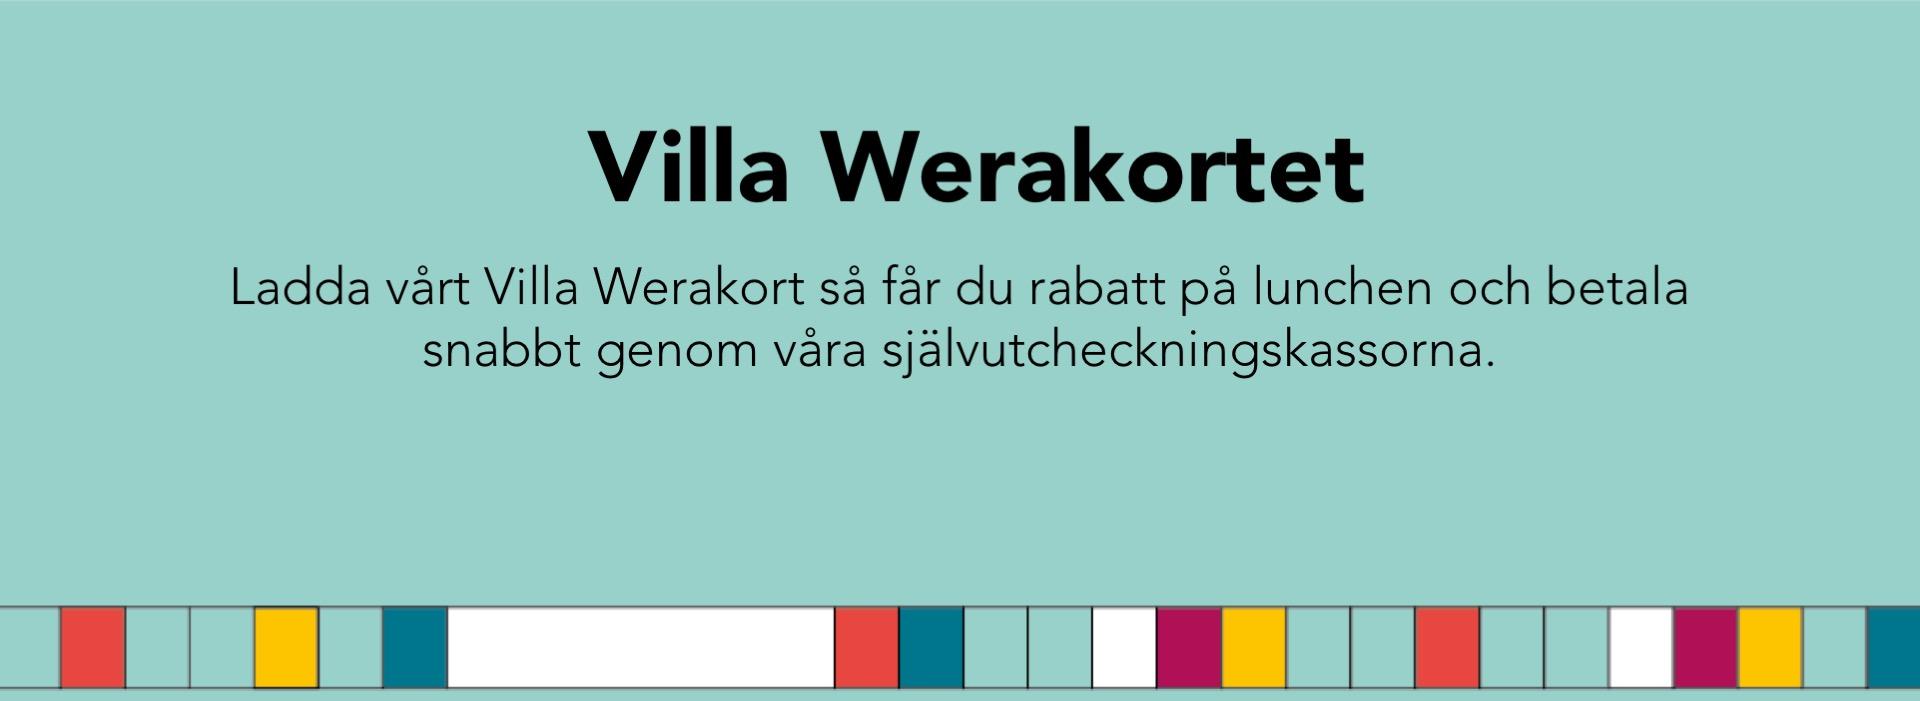 Villa-Werakortet